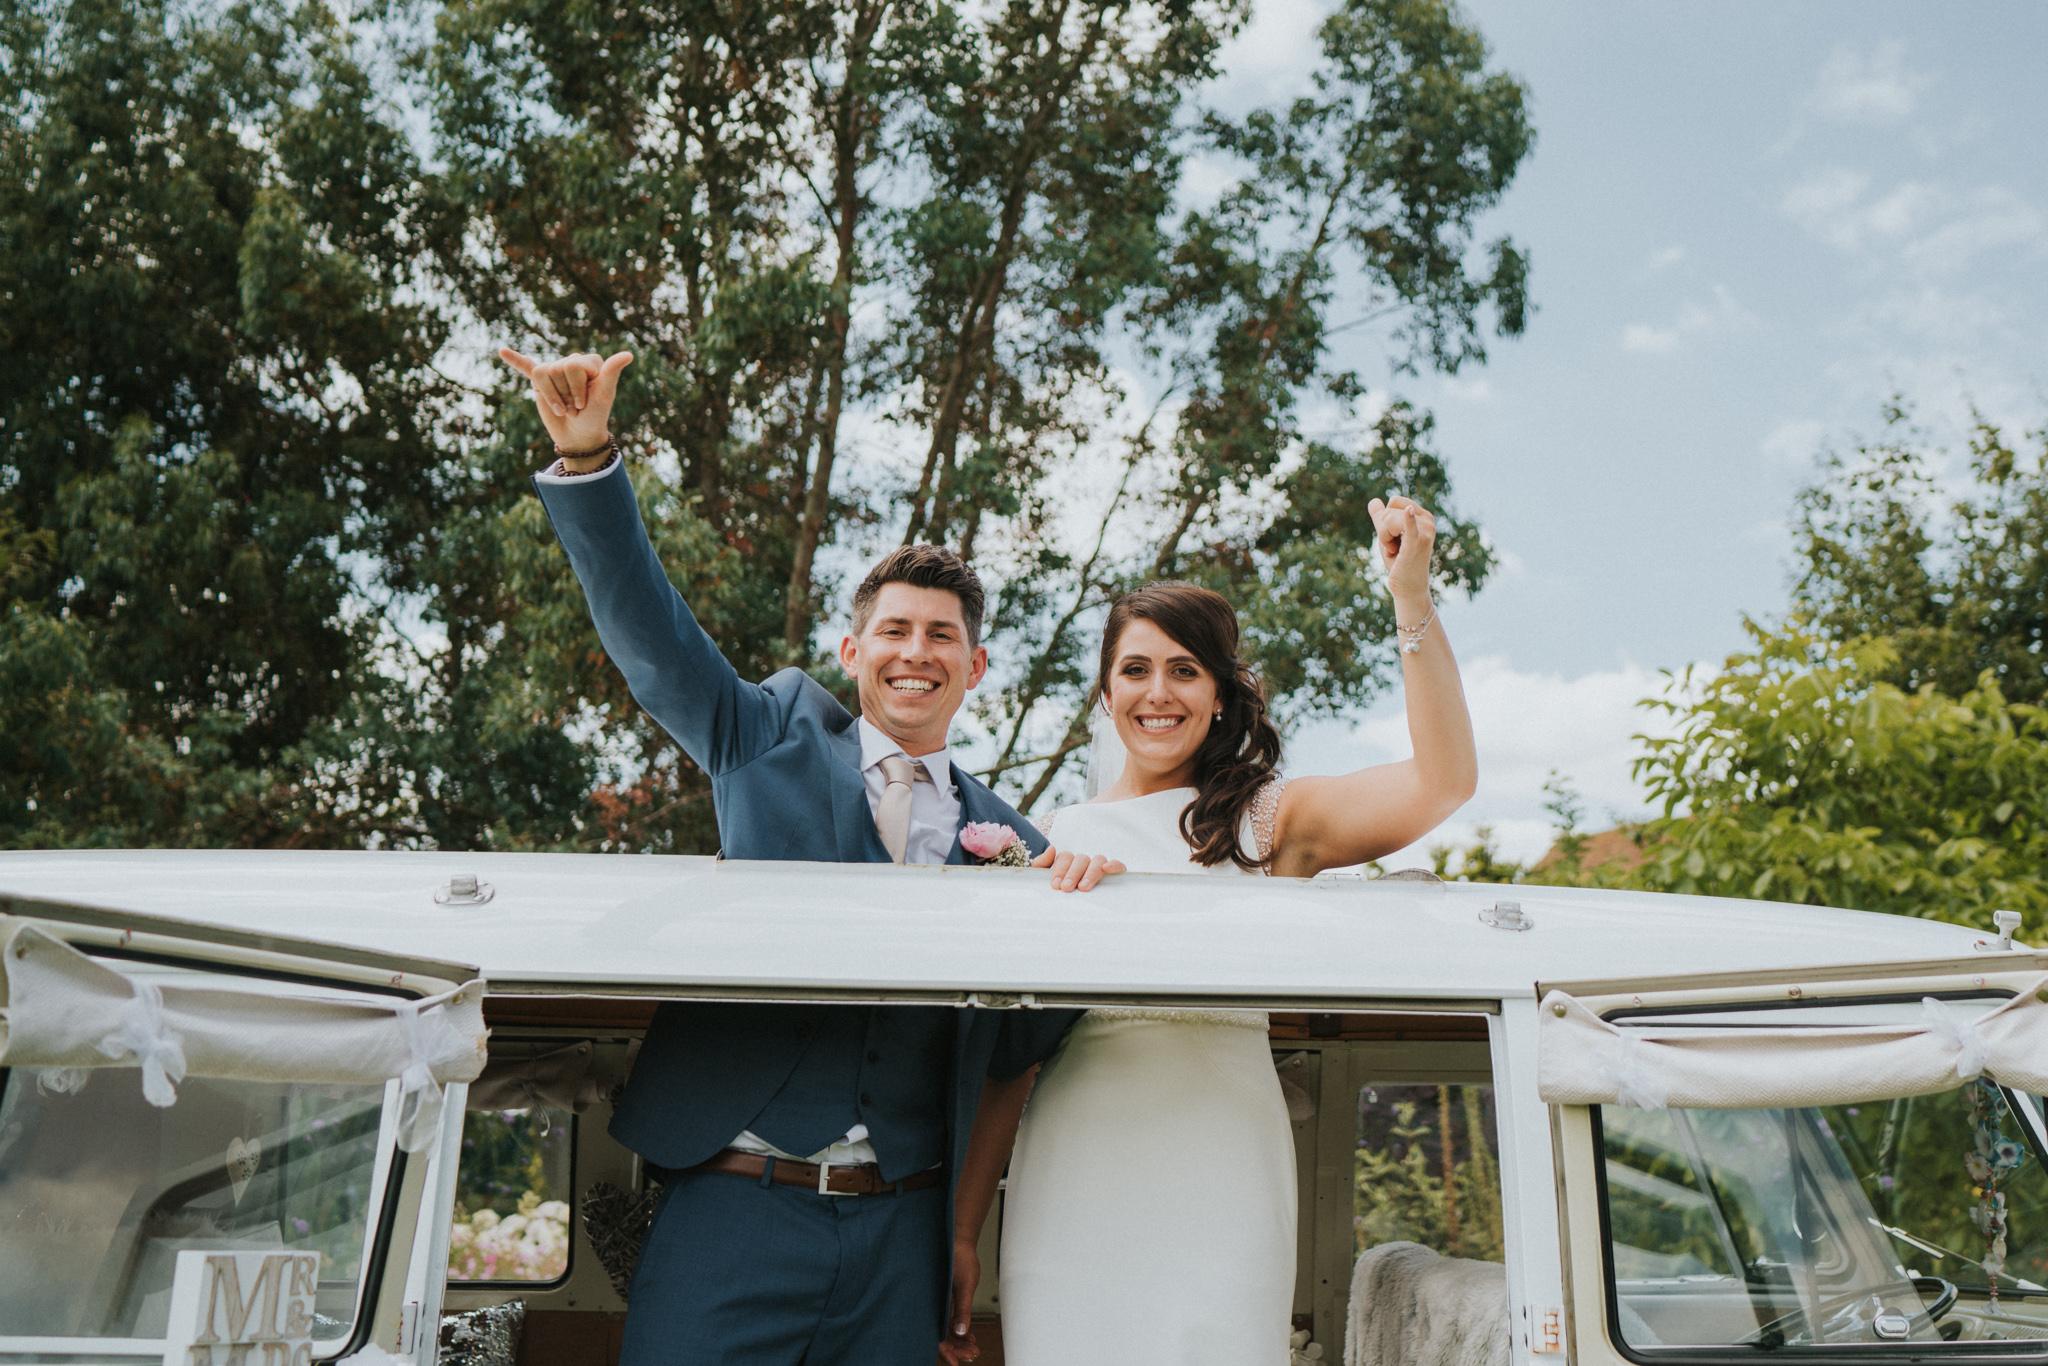 danielle-and-gareths-boho-wedding-previews-at-high-house-weddings-grace-elizabeth-colchester-essex-suffolk-norfolk-devon-alternative-wedding-and-lifestyle-photographer (43 of 76).jpg